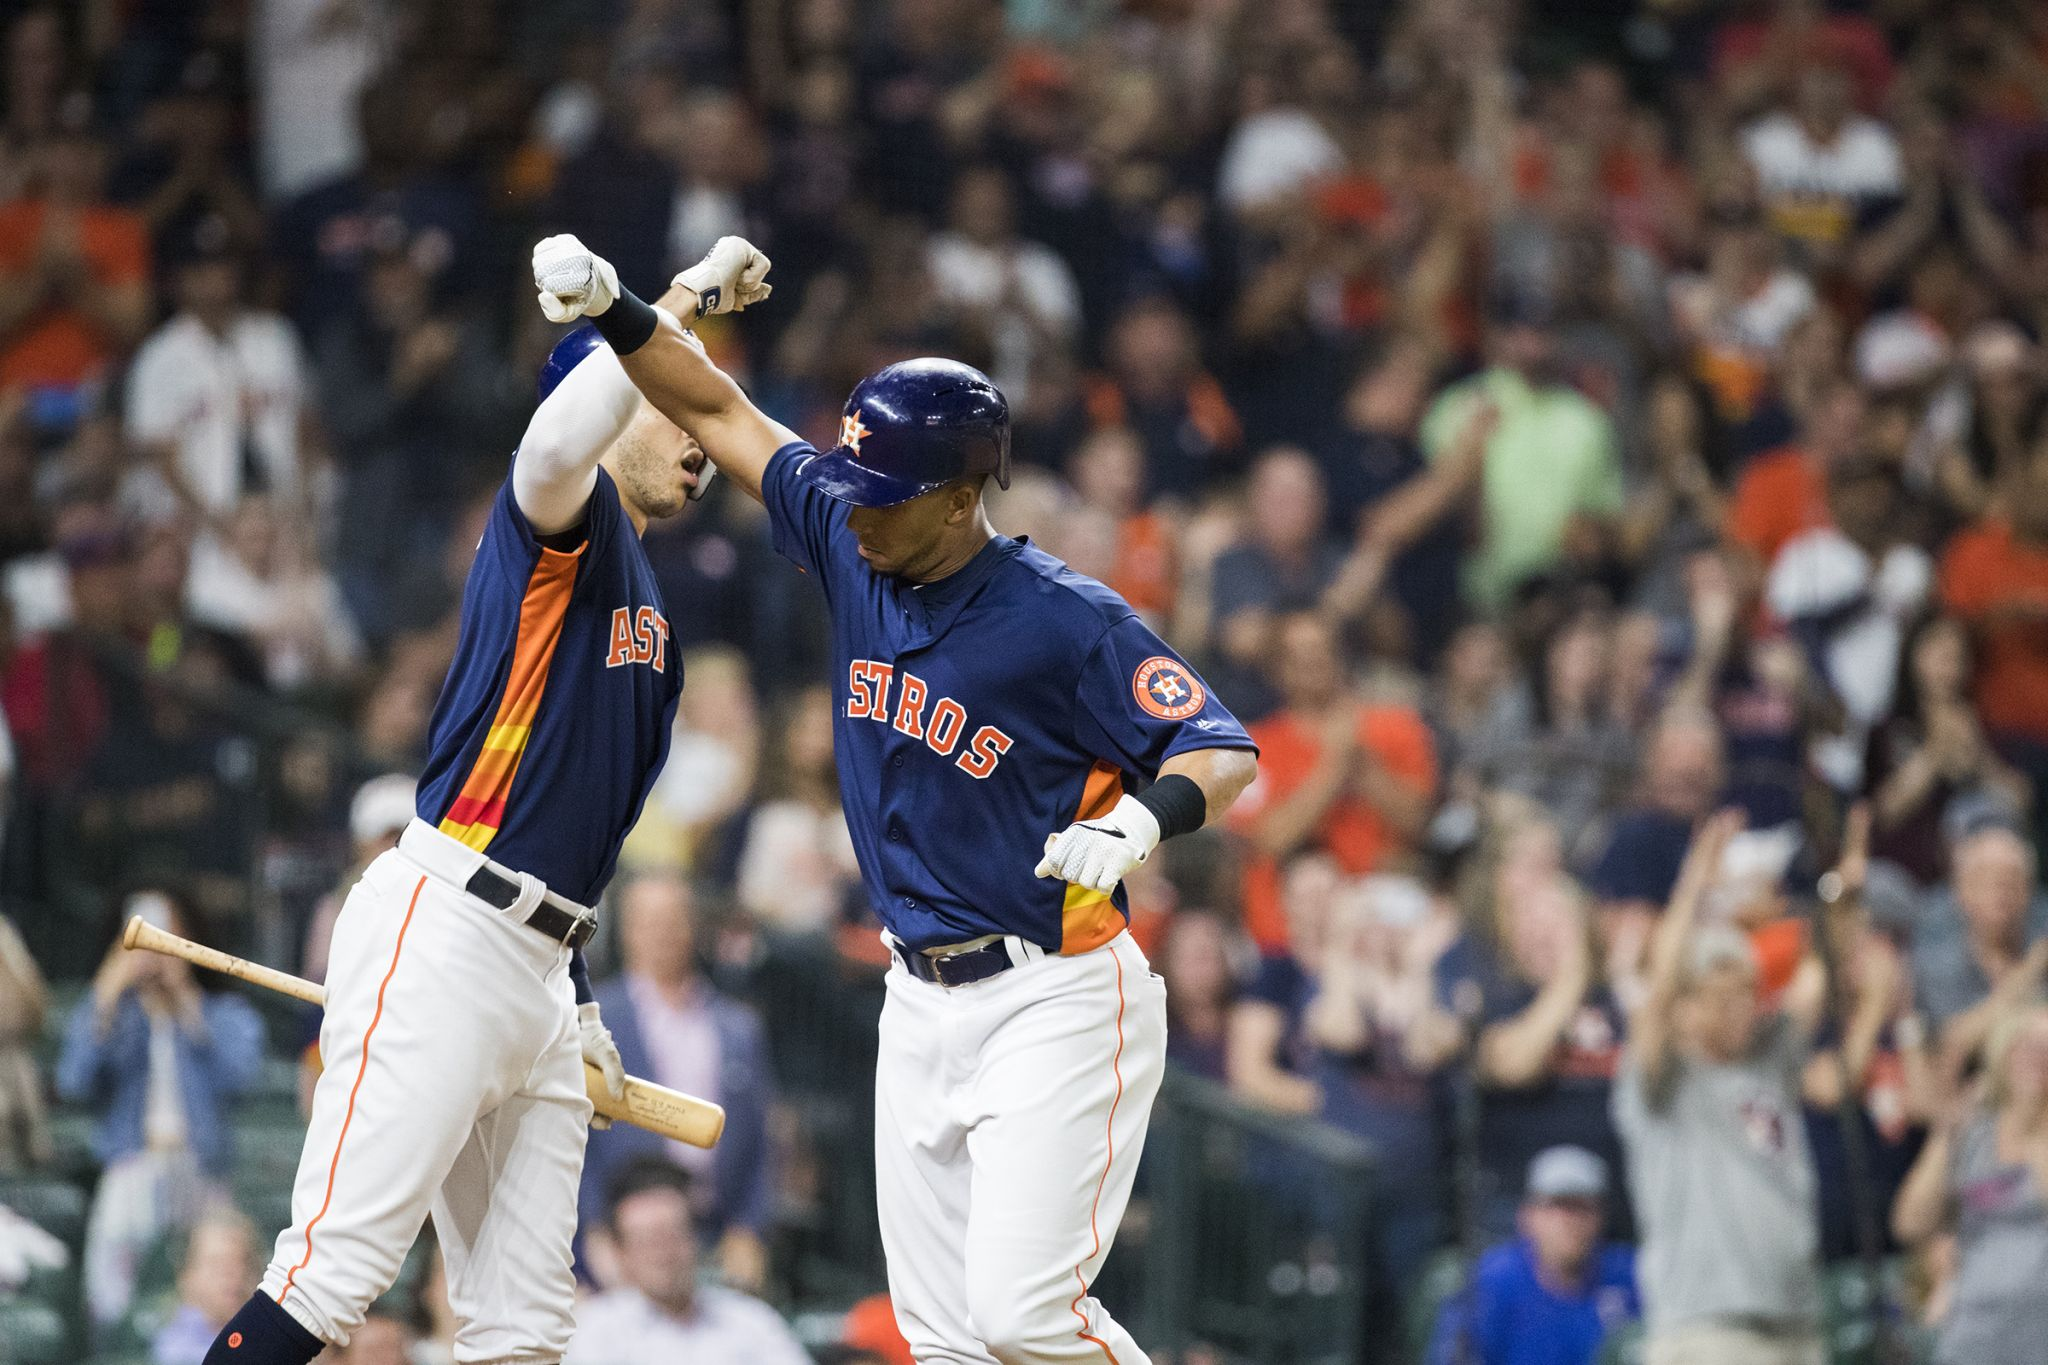 Solomon: Astros are a joy to watch